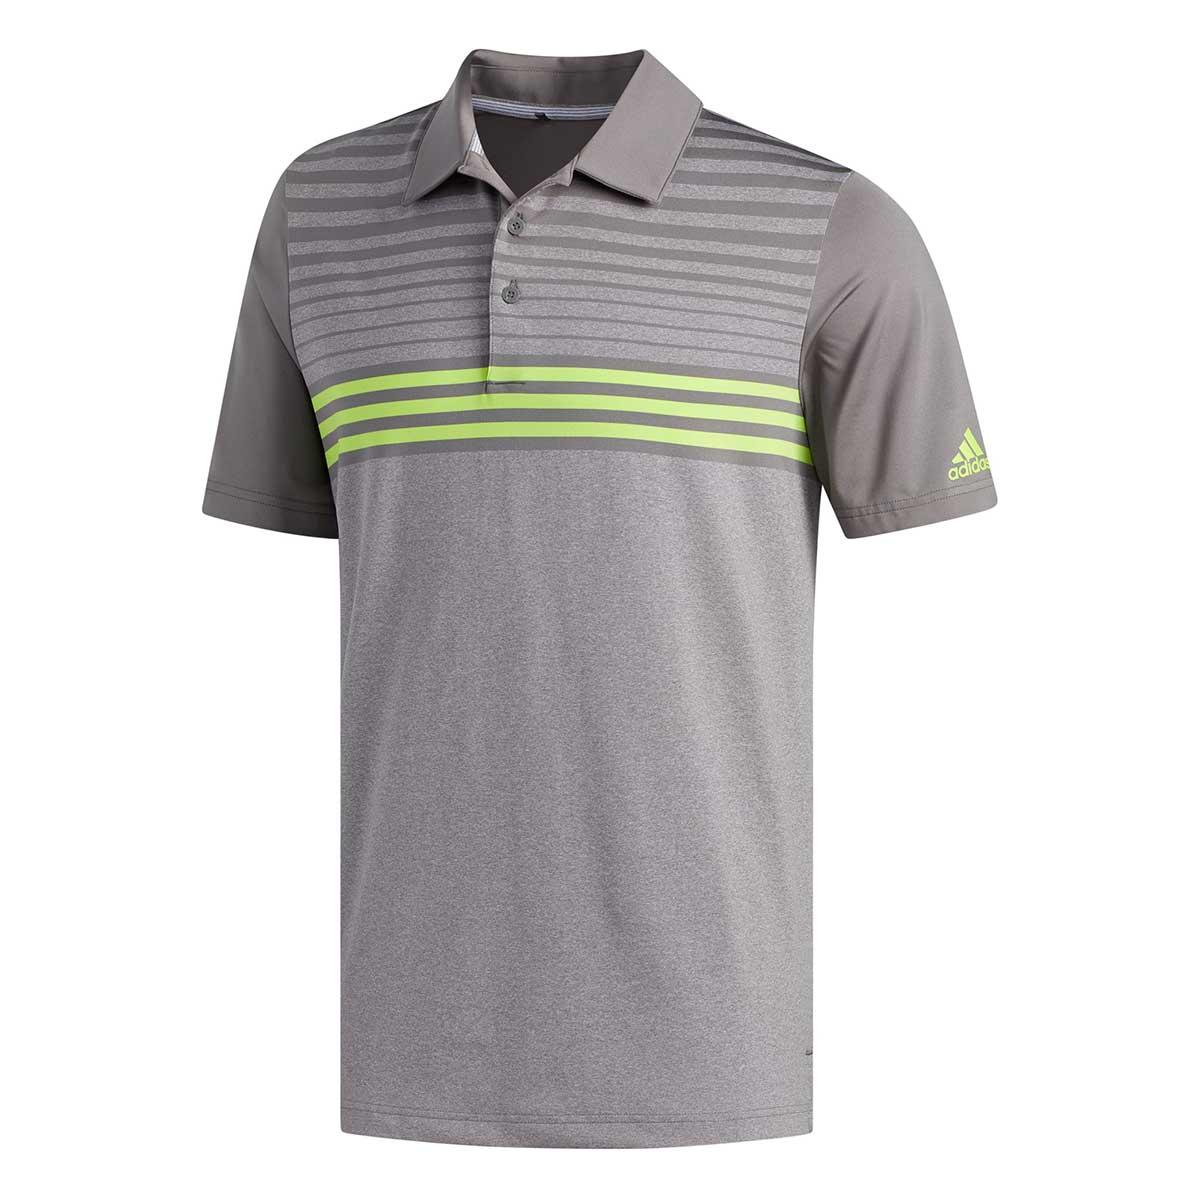 Adidas Ultimate 3-Stripe Heather Gradient Grey/Solar Polo